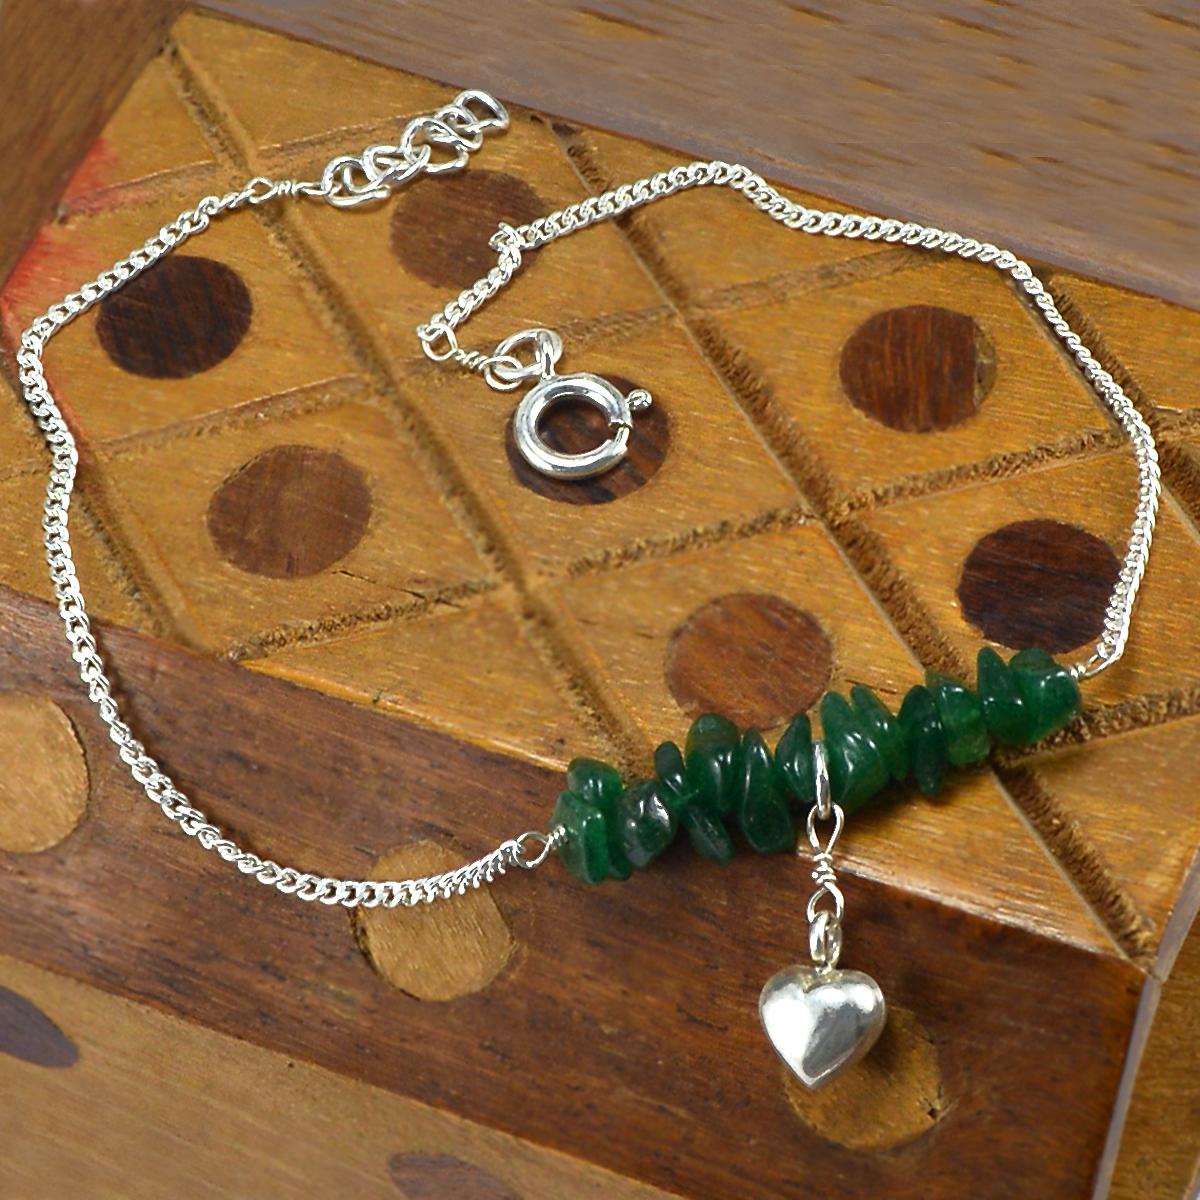 Handmade Jewelry Manufacturer Green Aventurine Gemstone 925 Sterling Silver Single Piece Anklet Jaipur Rajasthan India